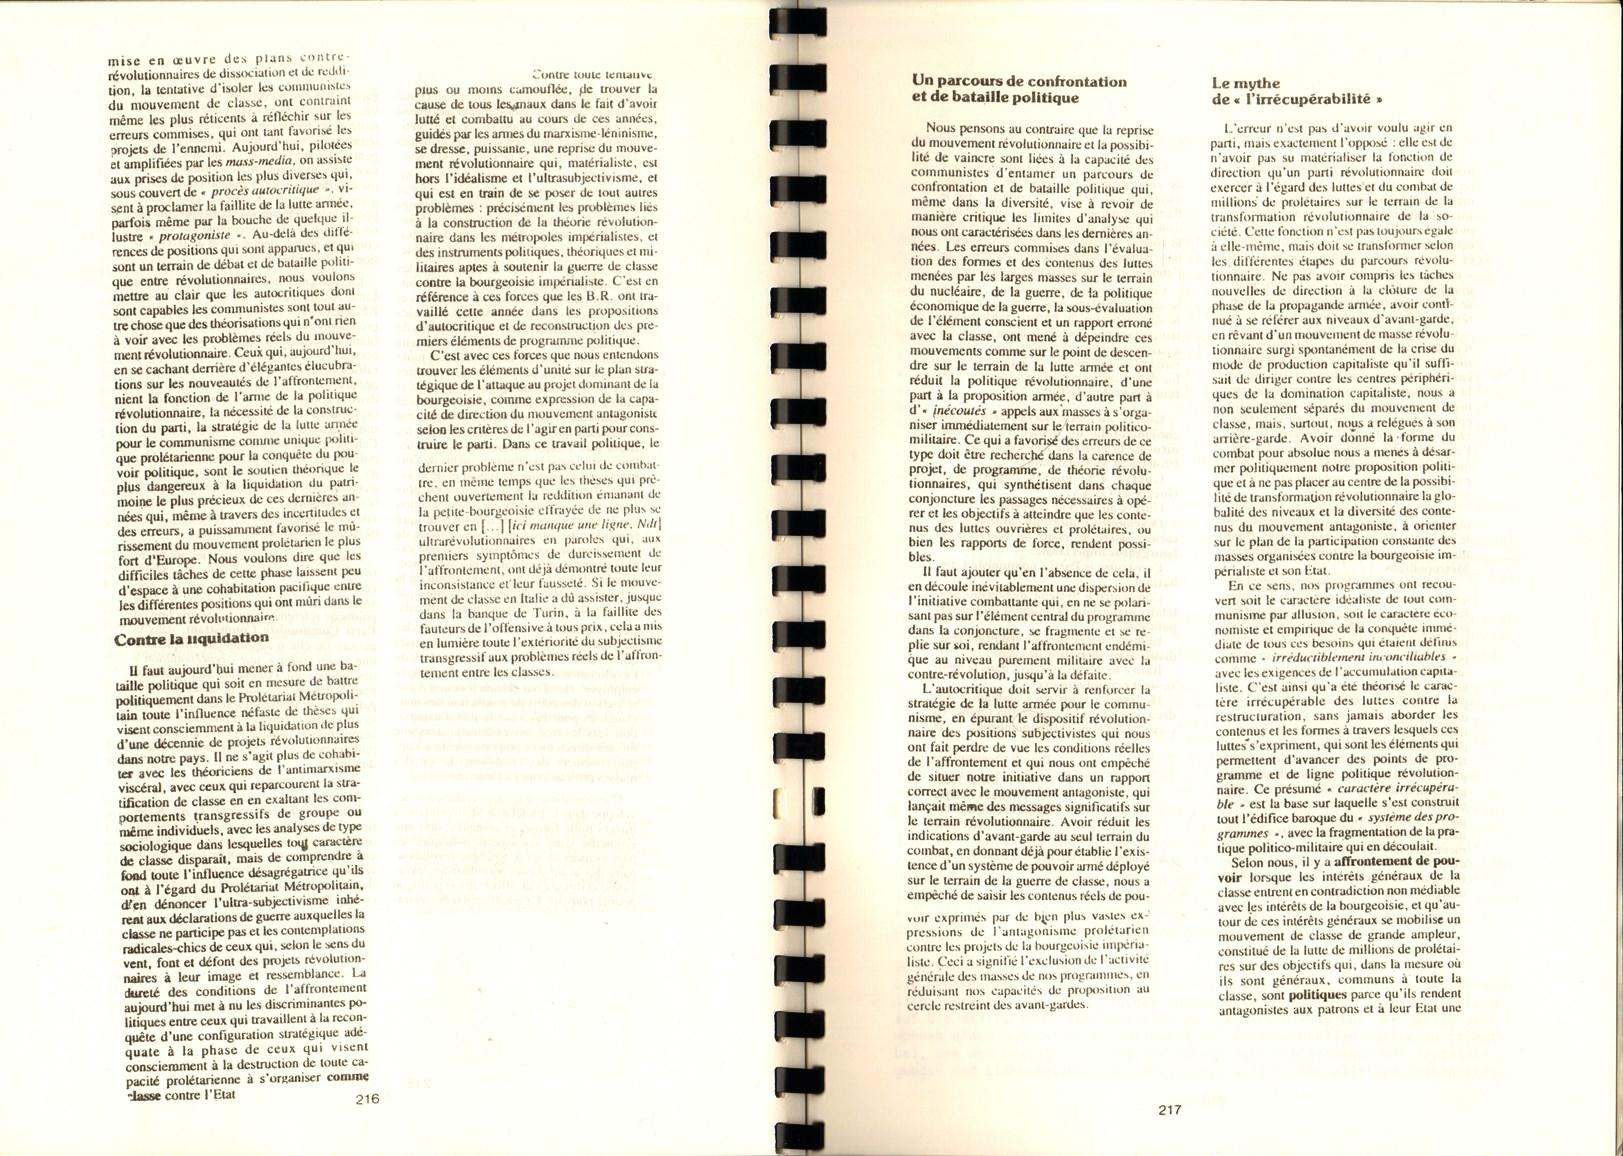 Internationale_Debatte_1985_Brigate_Rosse_109